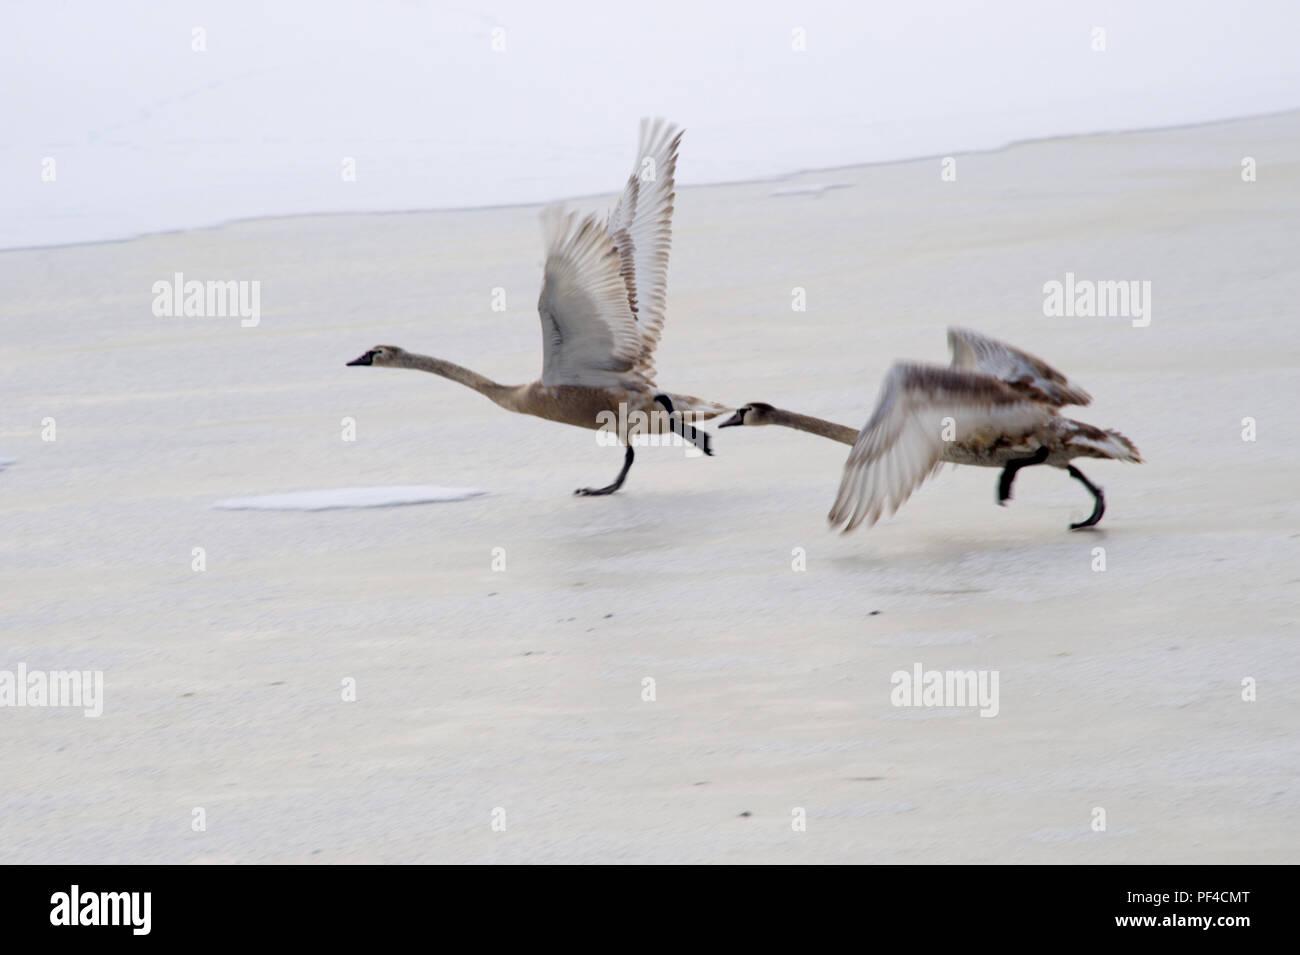 zwei Schwäne, Cygnus olor, beim Abflug vom zugefrorenen Teich, Winter | Cygnus olor, two swans taking off, winter time Stock Photo